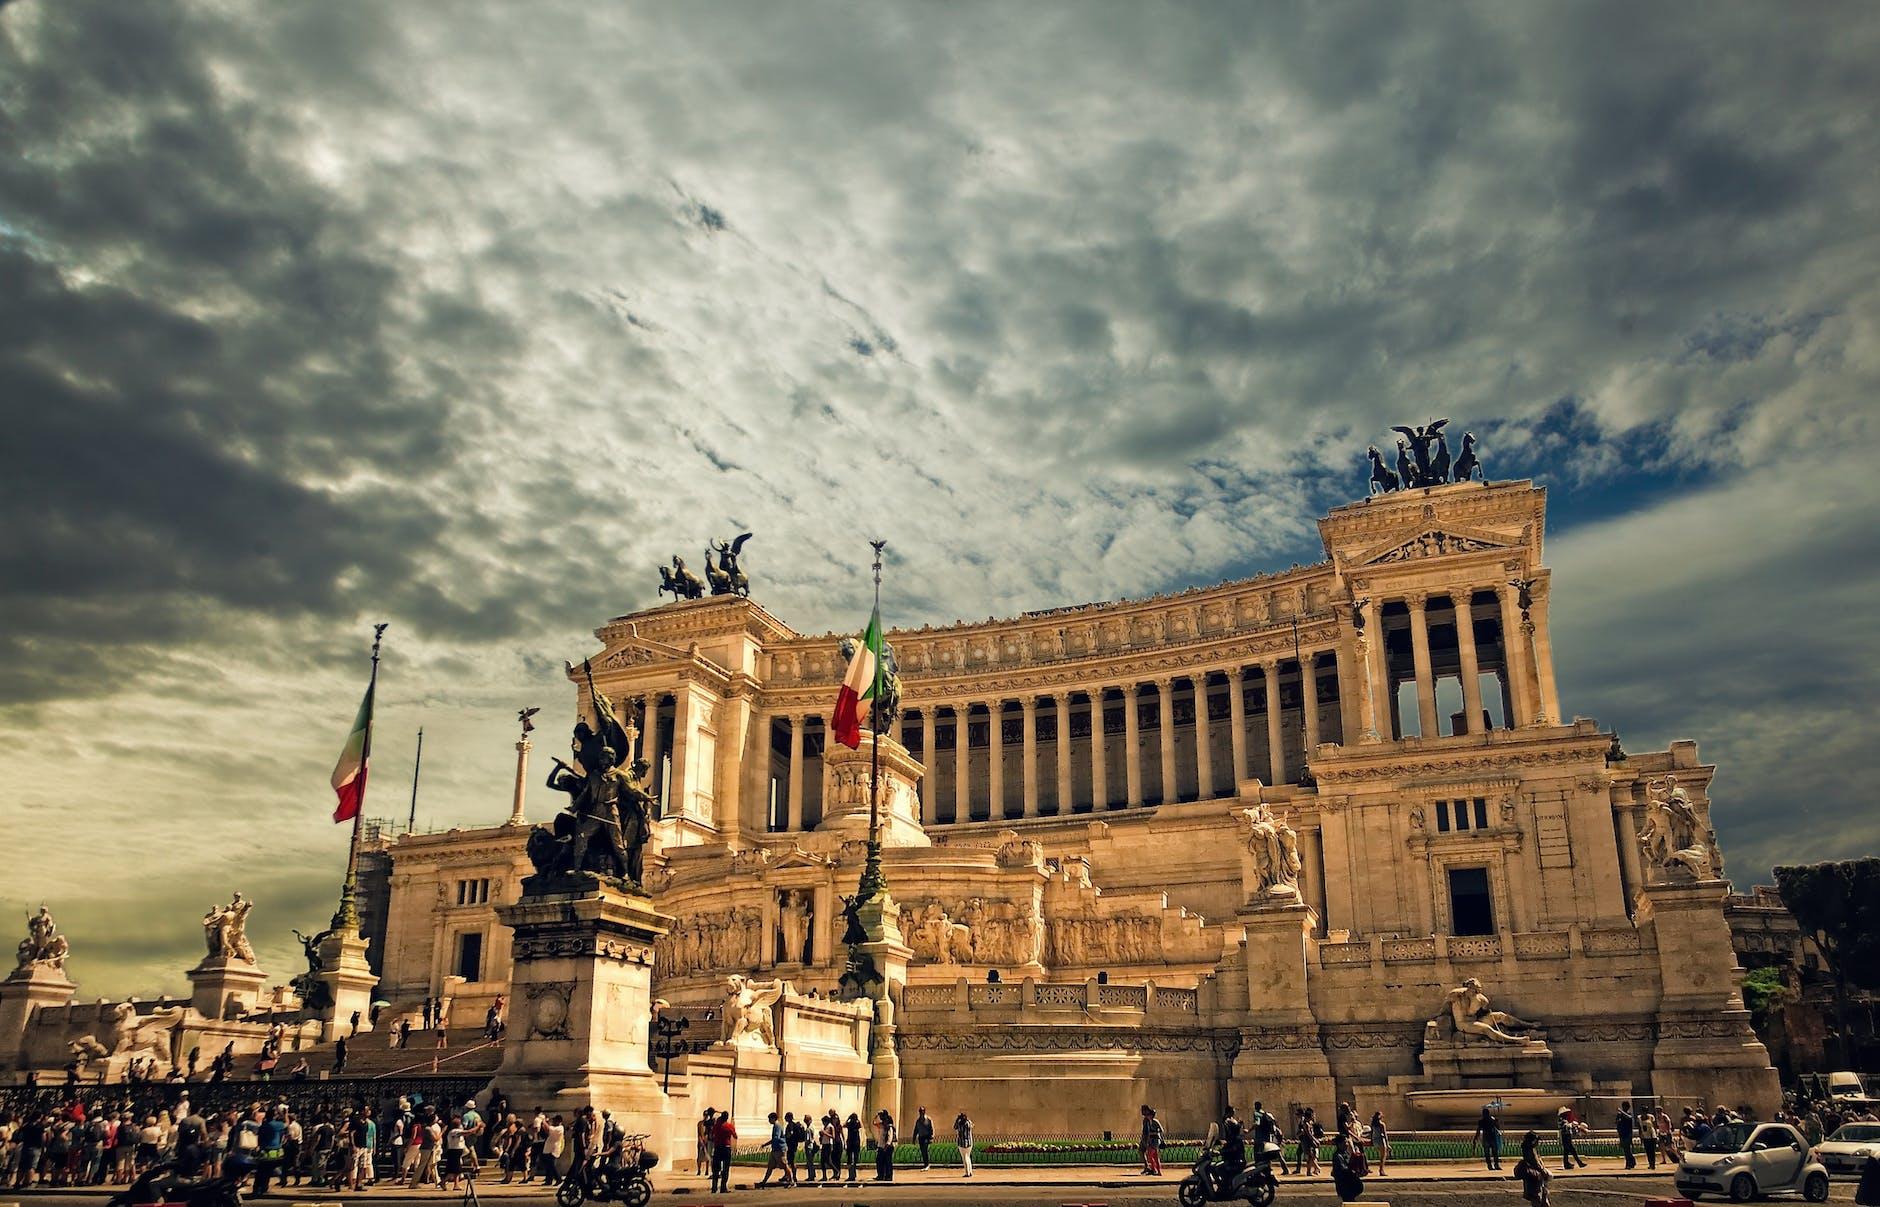 https://images.pexels.com/photos/56886/vittorio-emanuele-monument-rome-rome-palace-altare-della-patria-56886.jpeg?auto=compress&cs=tinysrgb&dpr=2&h=650&w=940